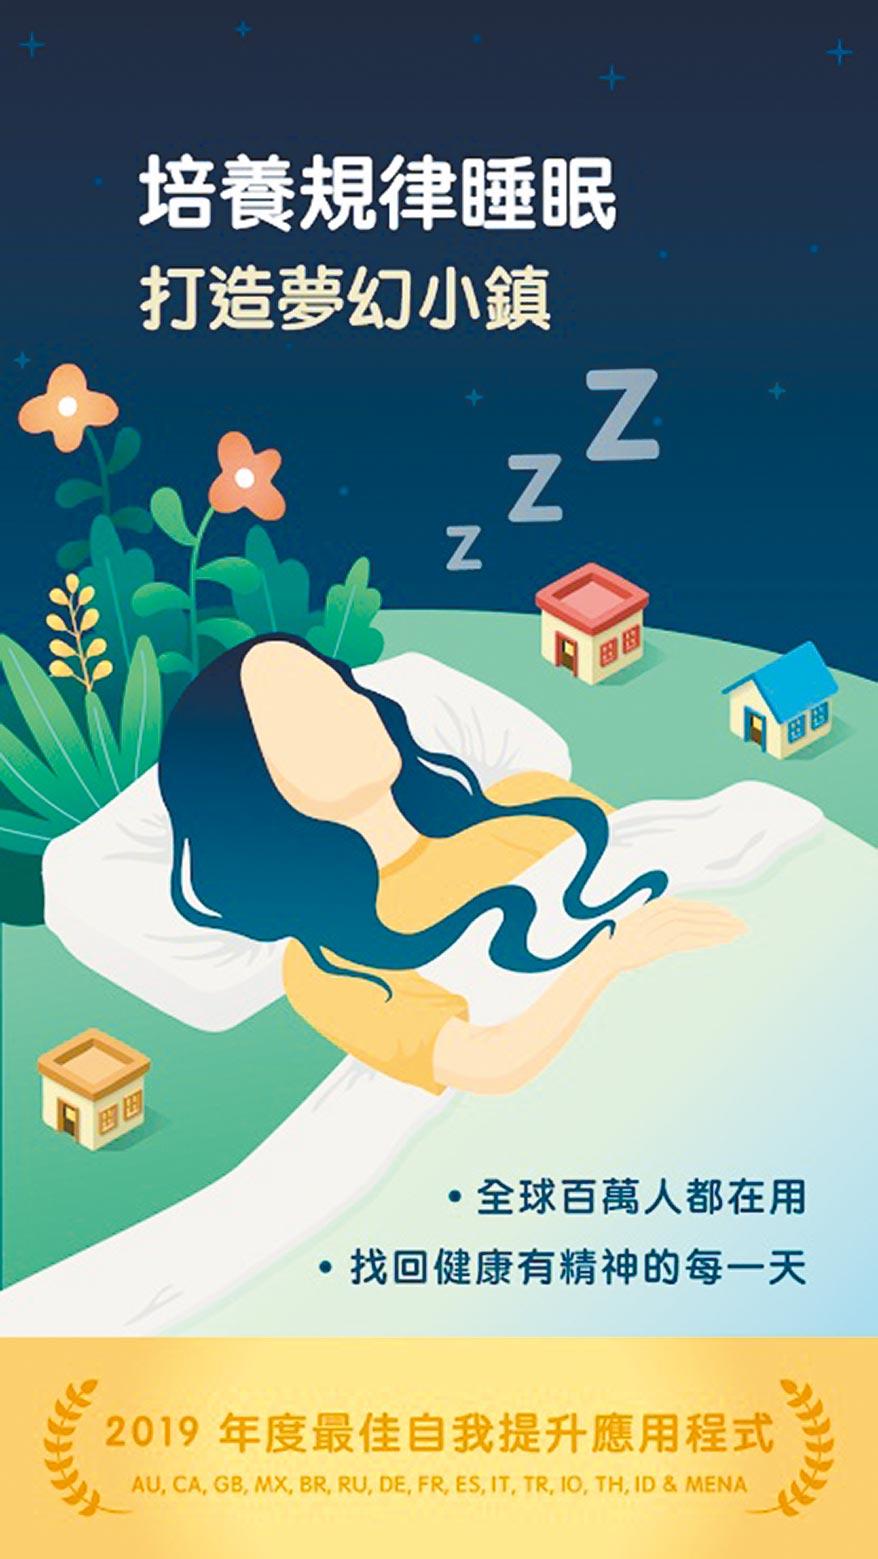 Google Play 2019年度最佳榜單中,《SleepTown睡眠小鎮》獲得台、港「年度最佳應用程式」。(Google官網)